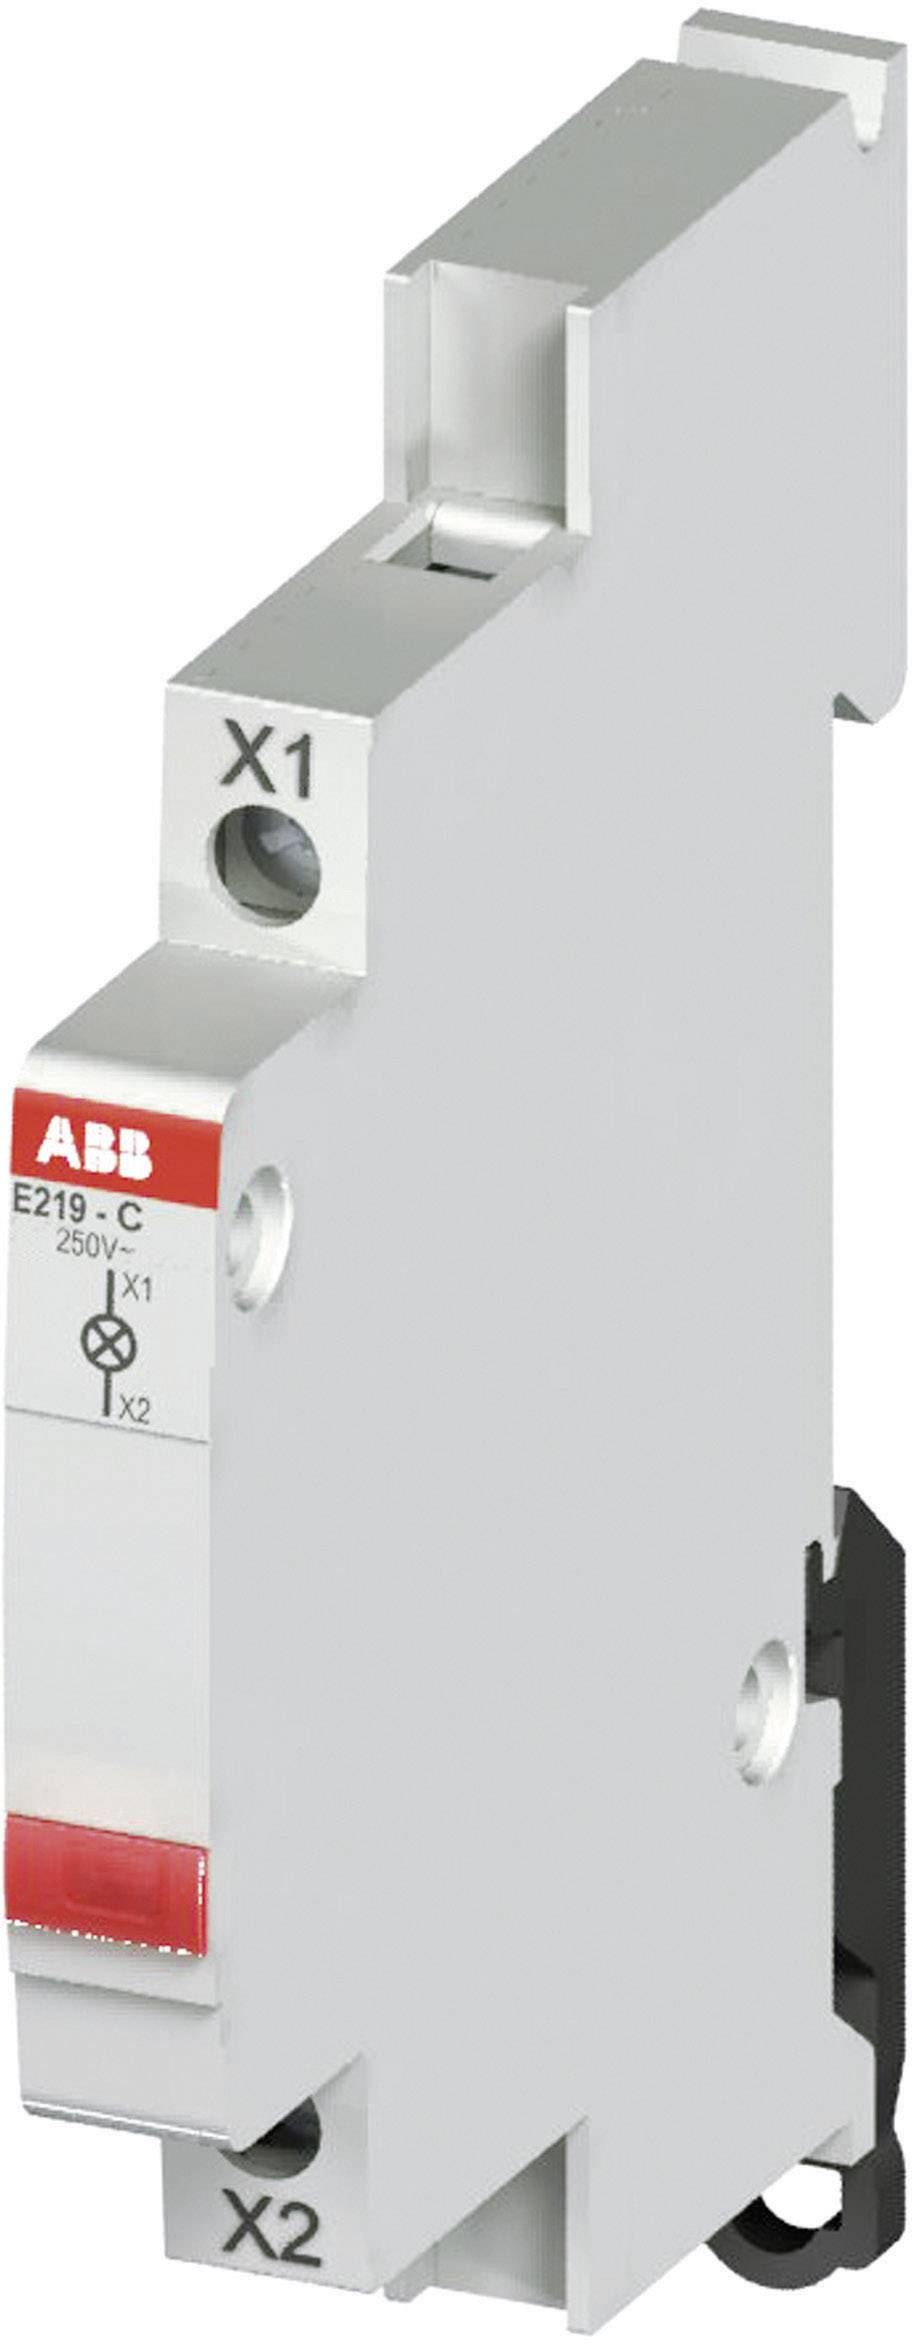 Kontrolka ABB na DIN lištu, 115/250 V, žltá LED, 2CCA703403R0001